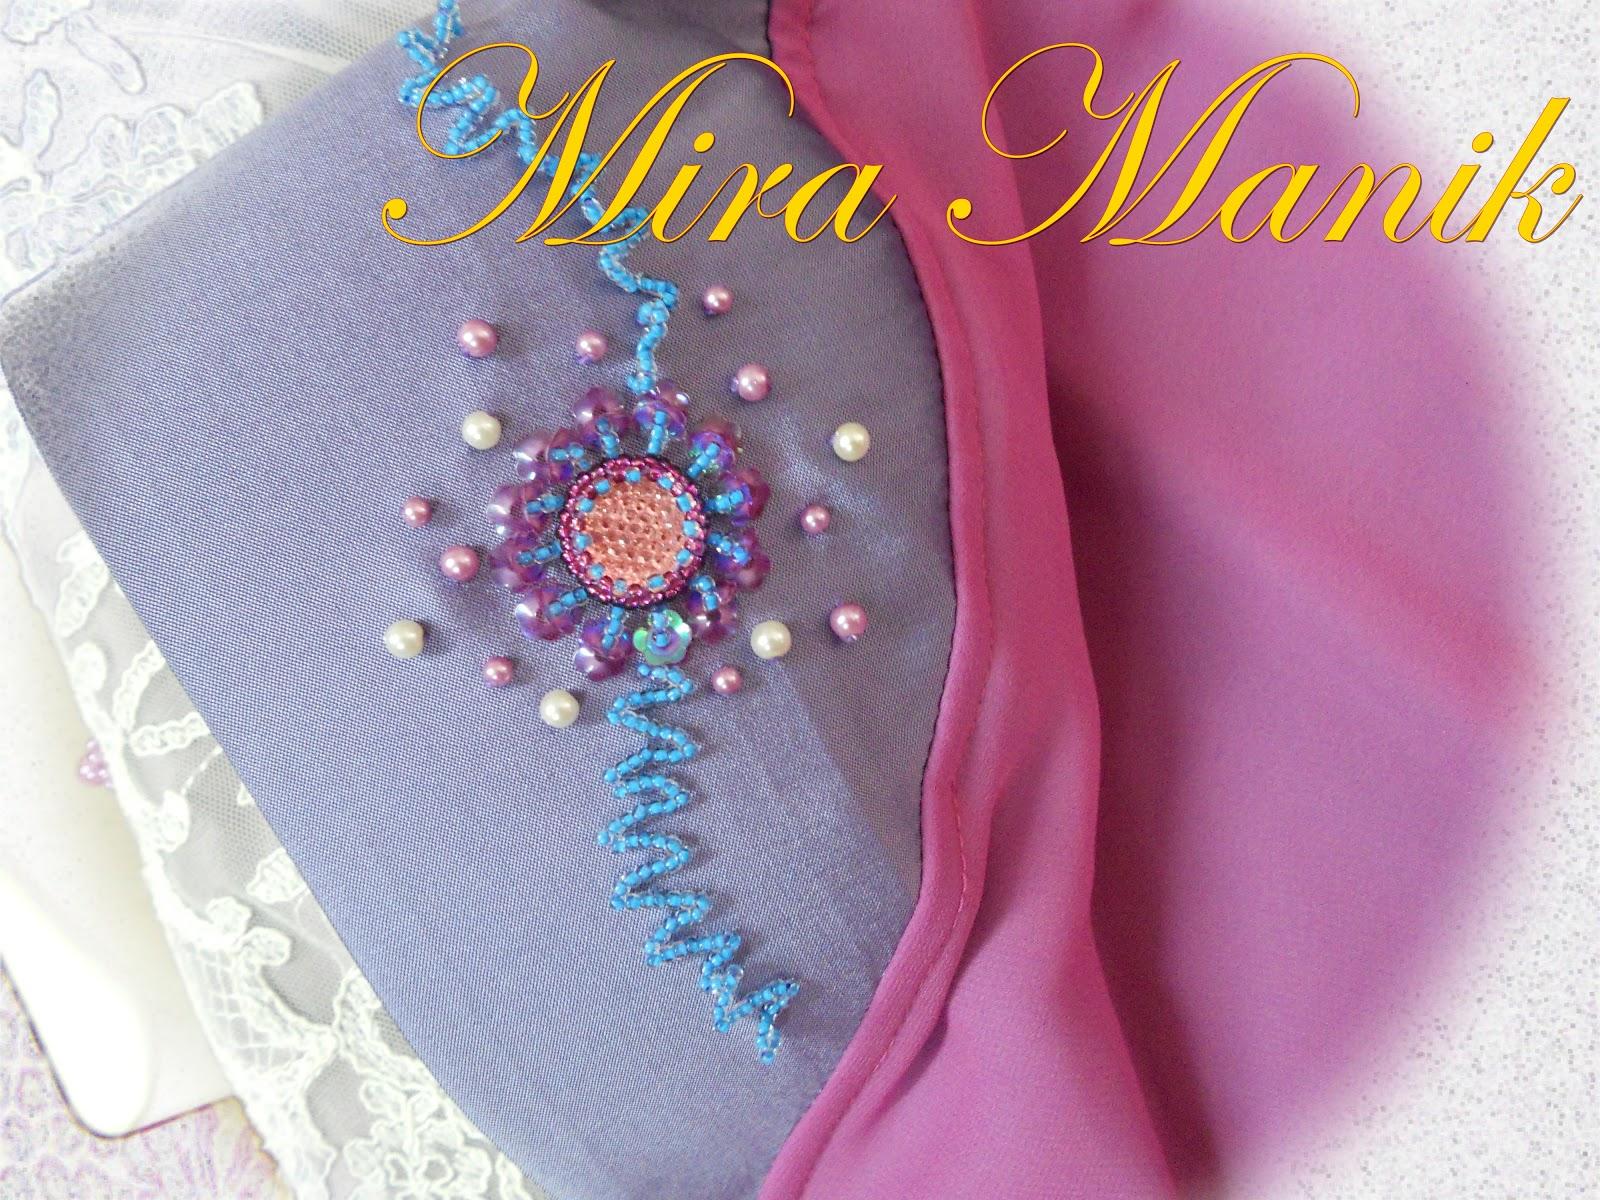 Mira Manik Kedai Manik Online | newhairstylesformen2014.com